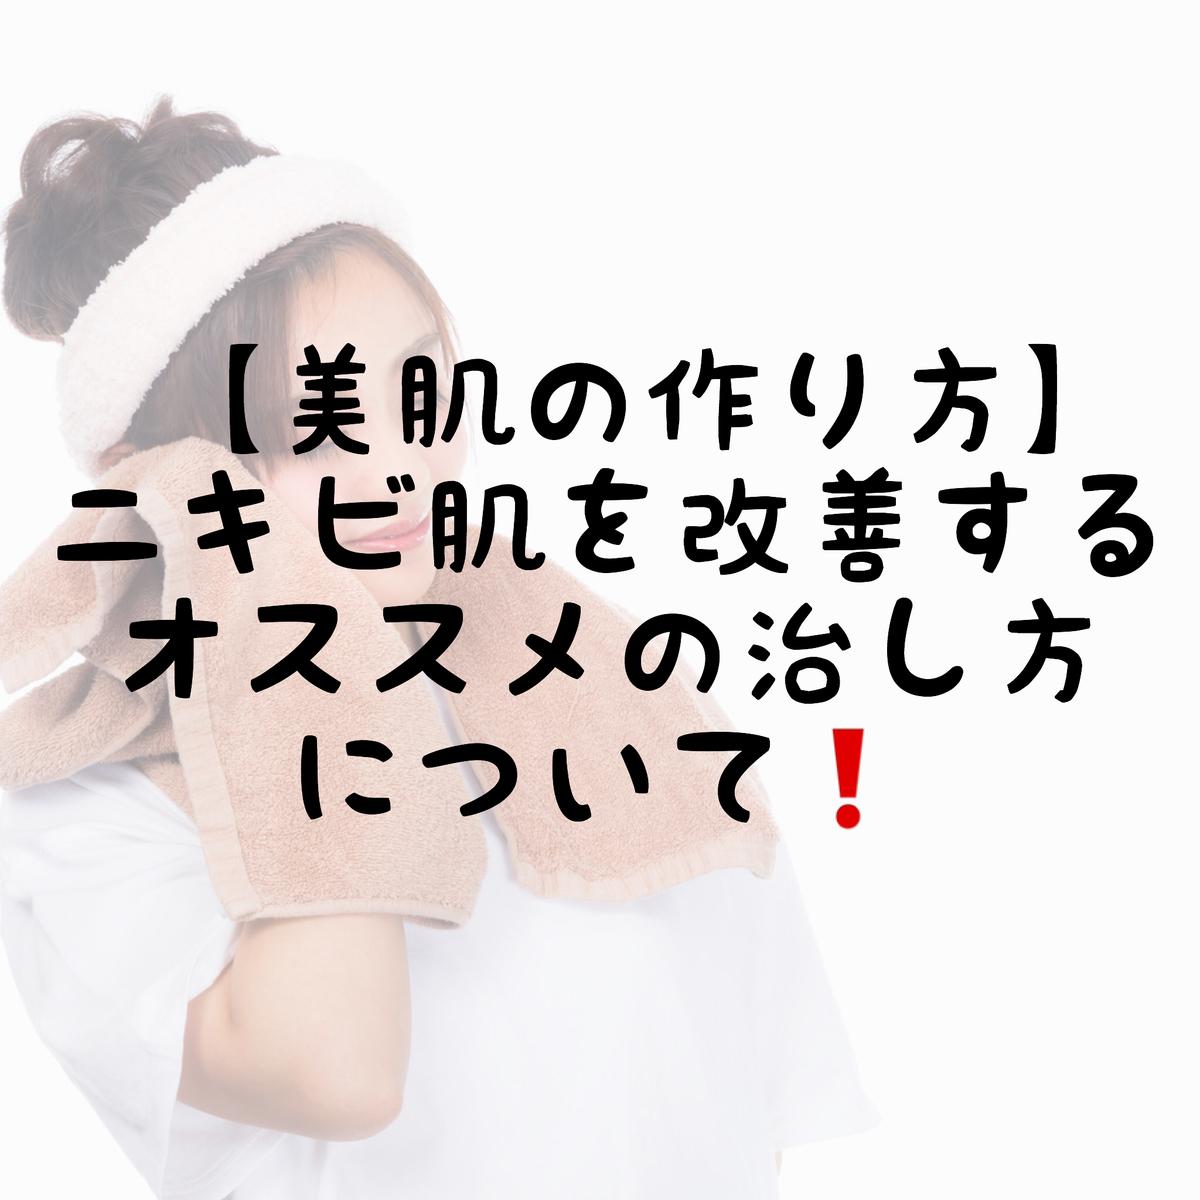 f:id:nokonoko_o:20200523150300j:plain